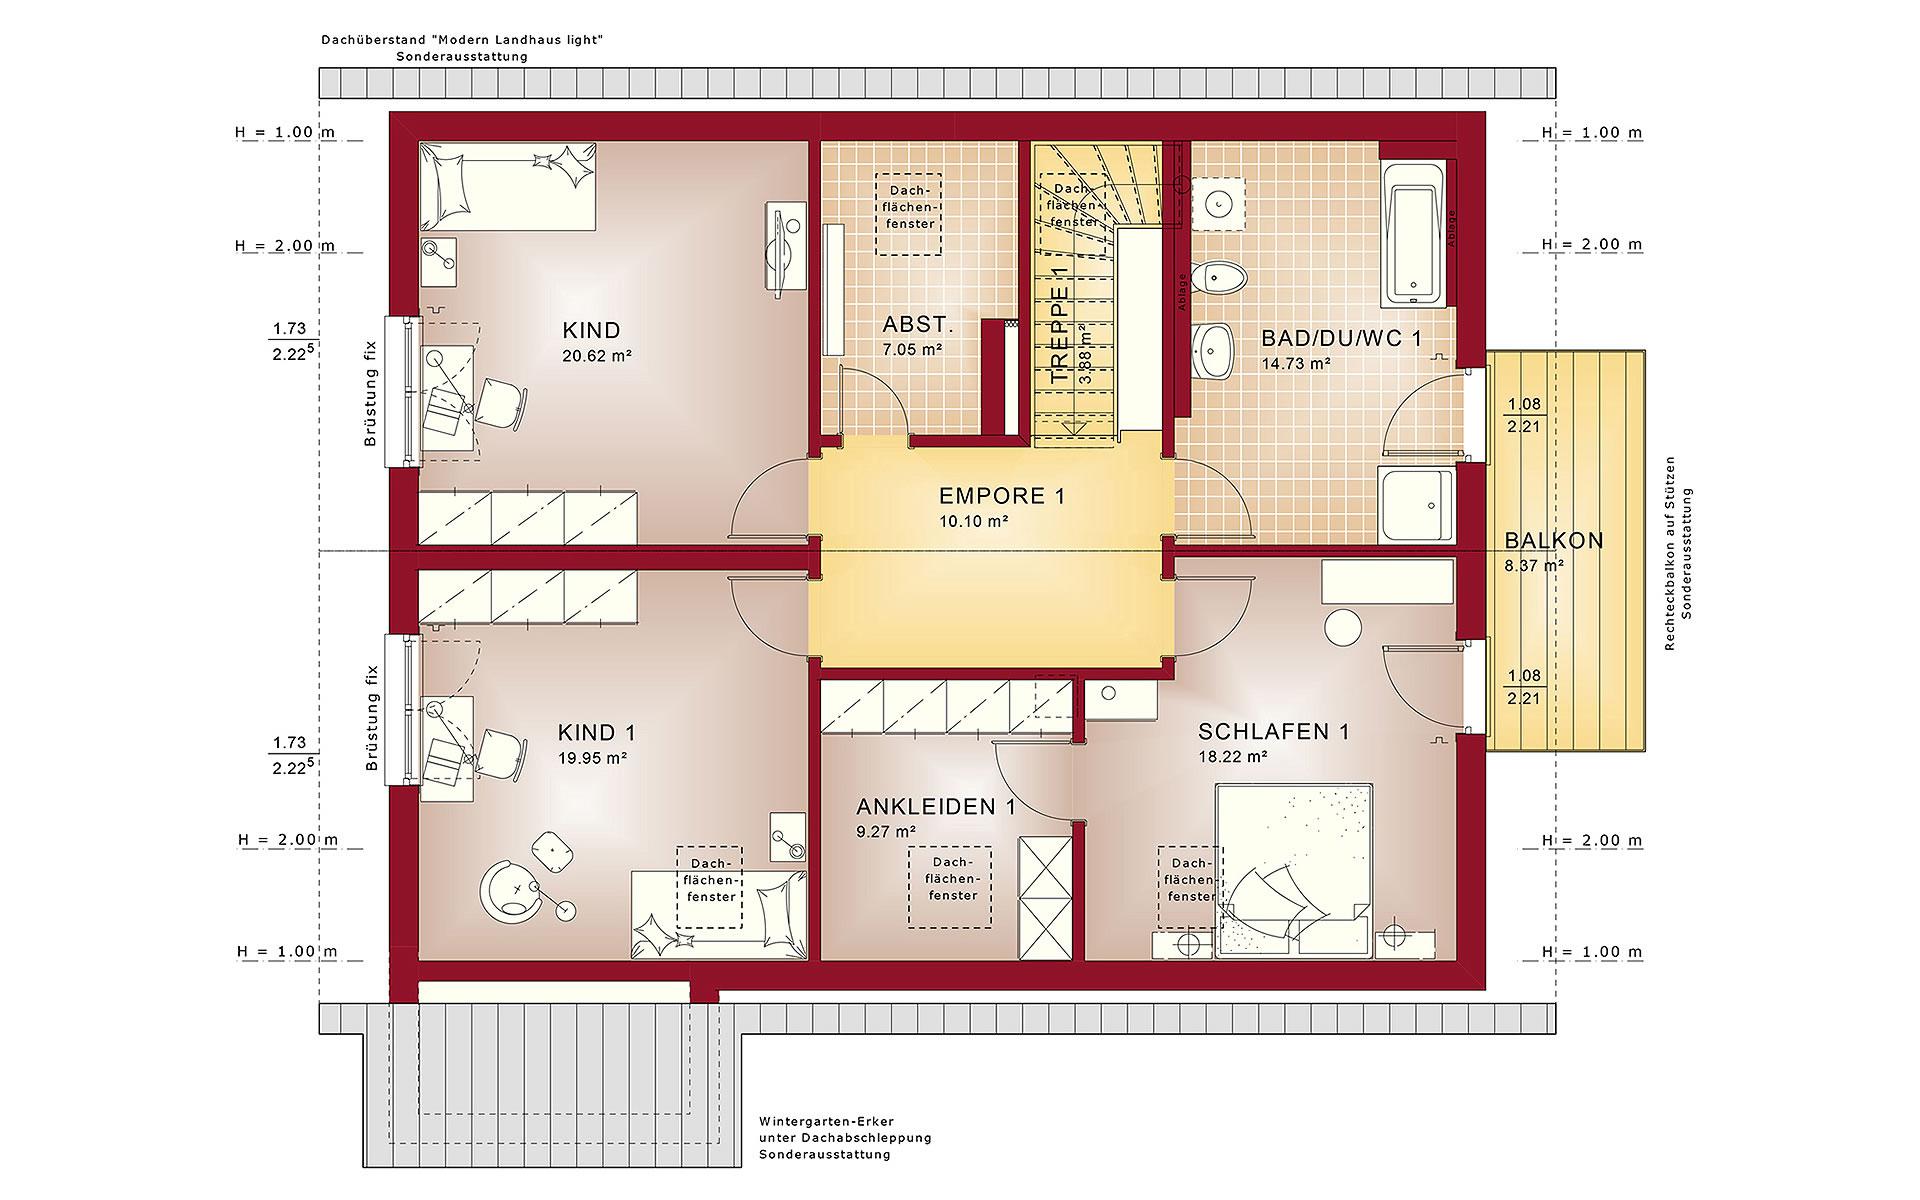 Dachgeschoss CELEBRATION 207 V2 von Bien-Zenker GmbH